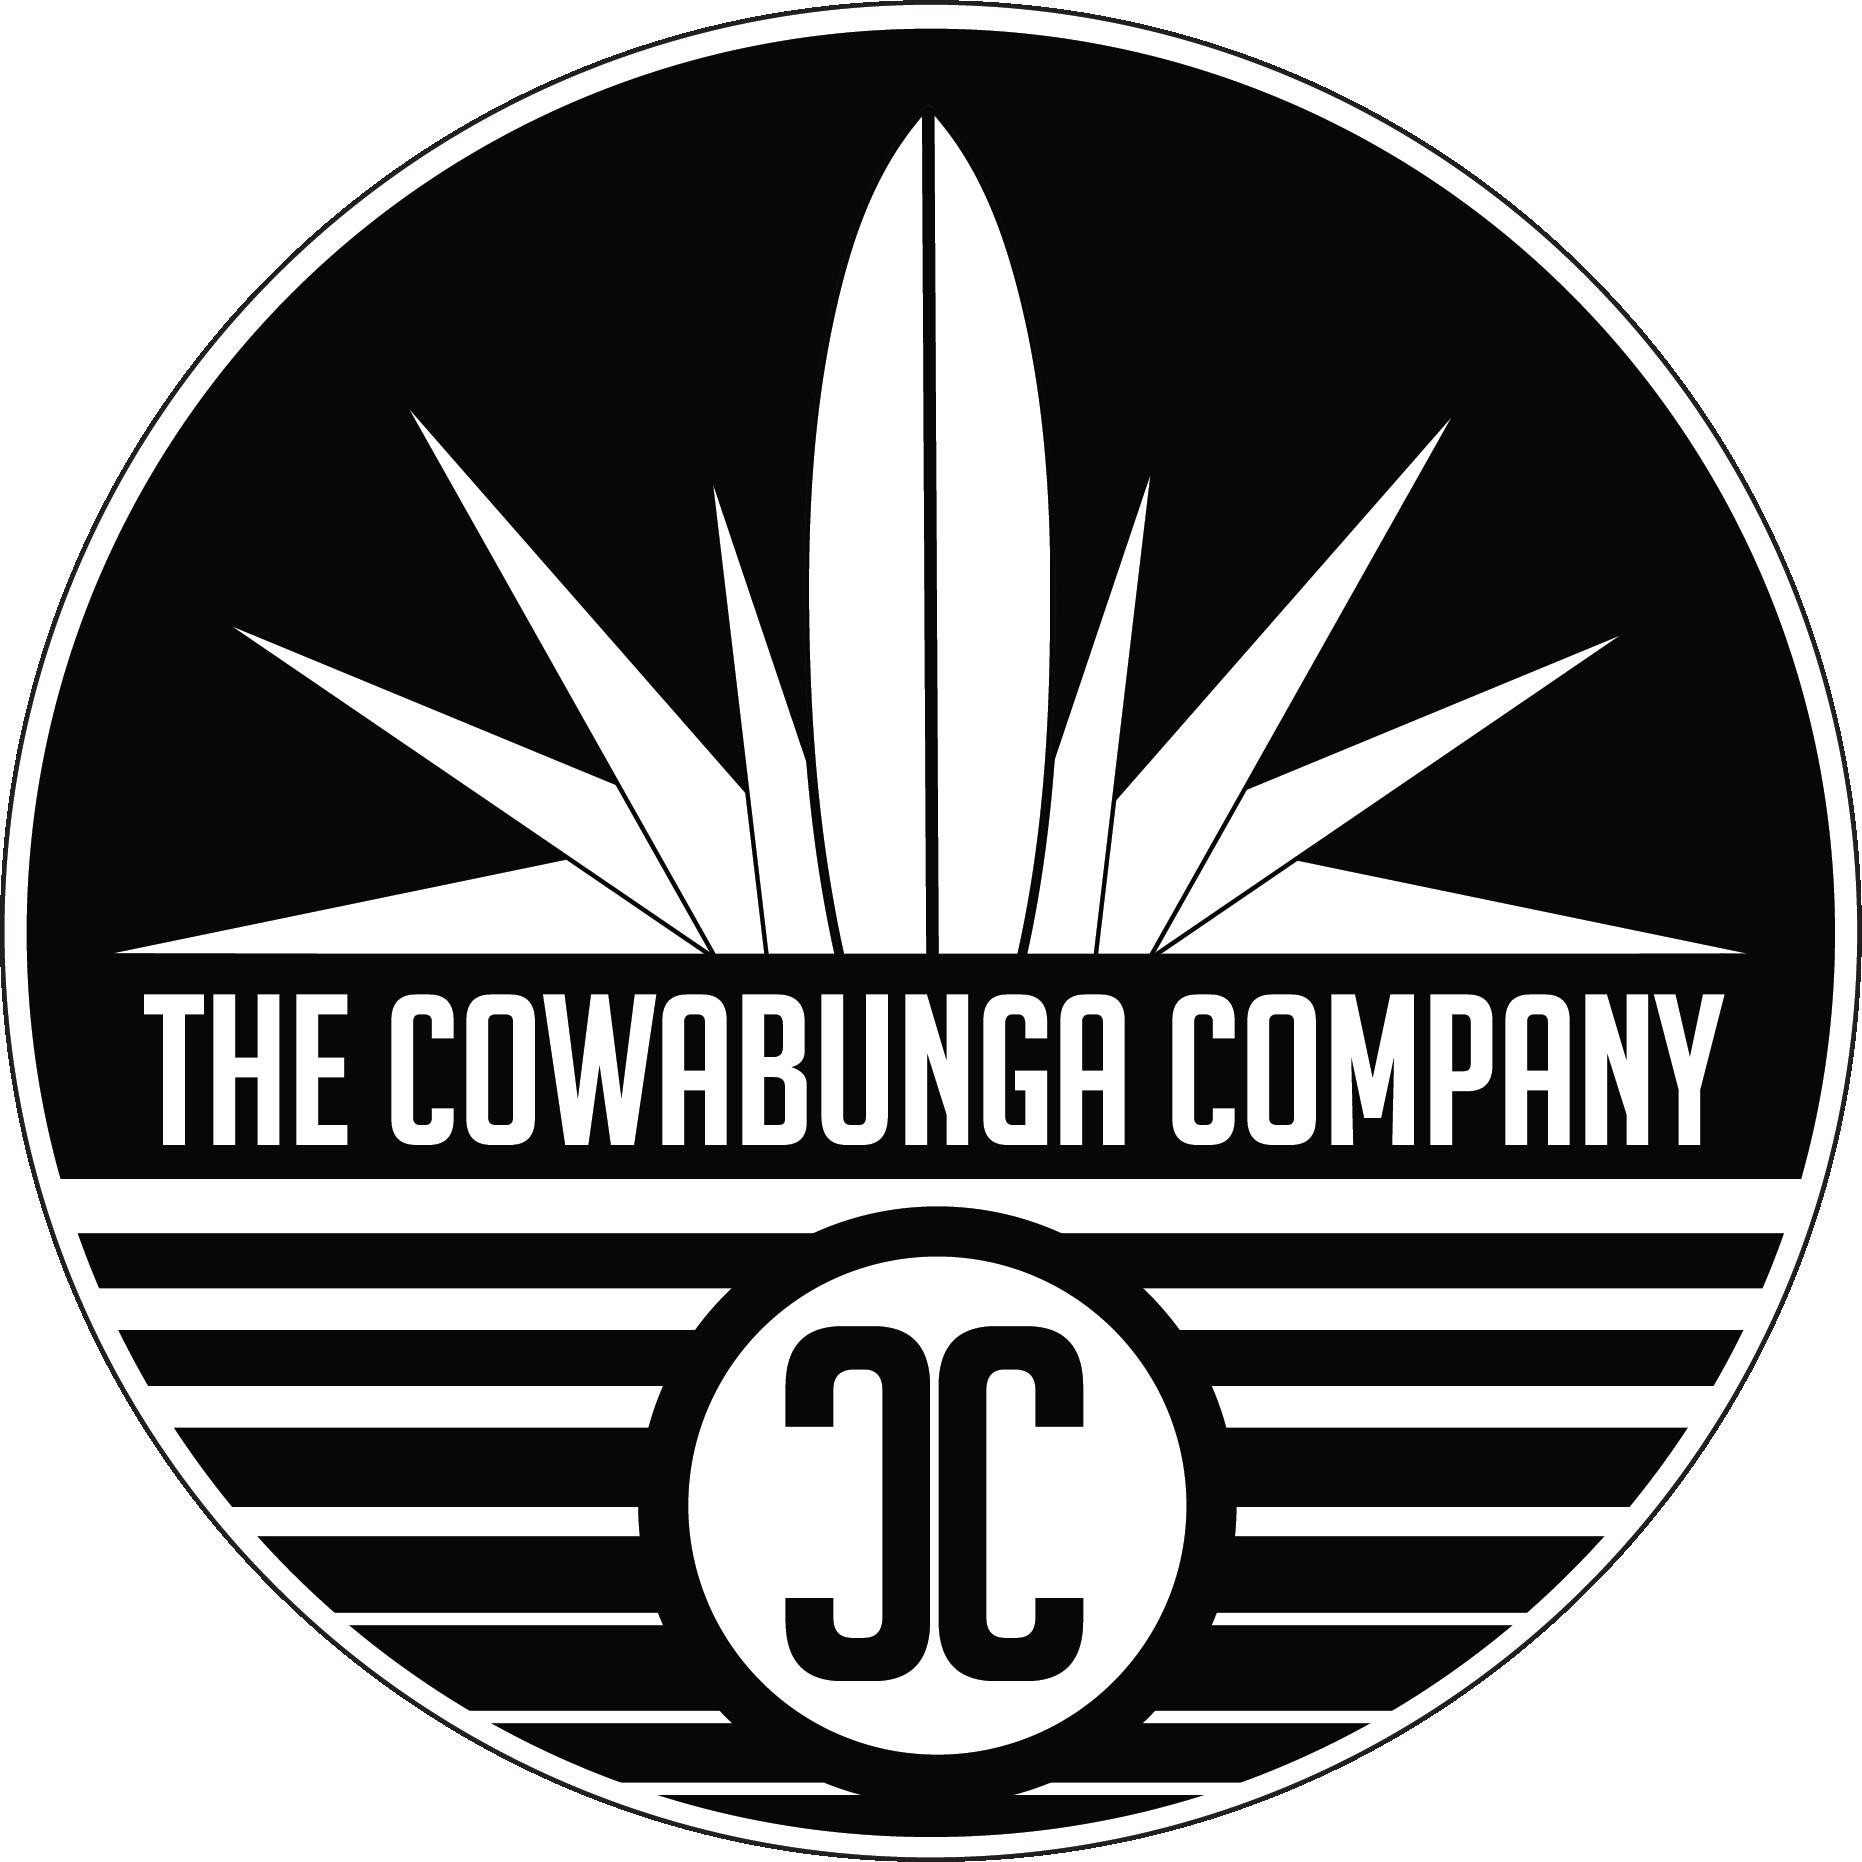 Cowabunga Company